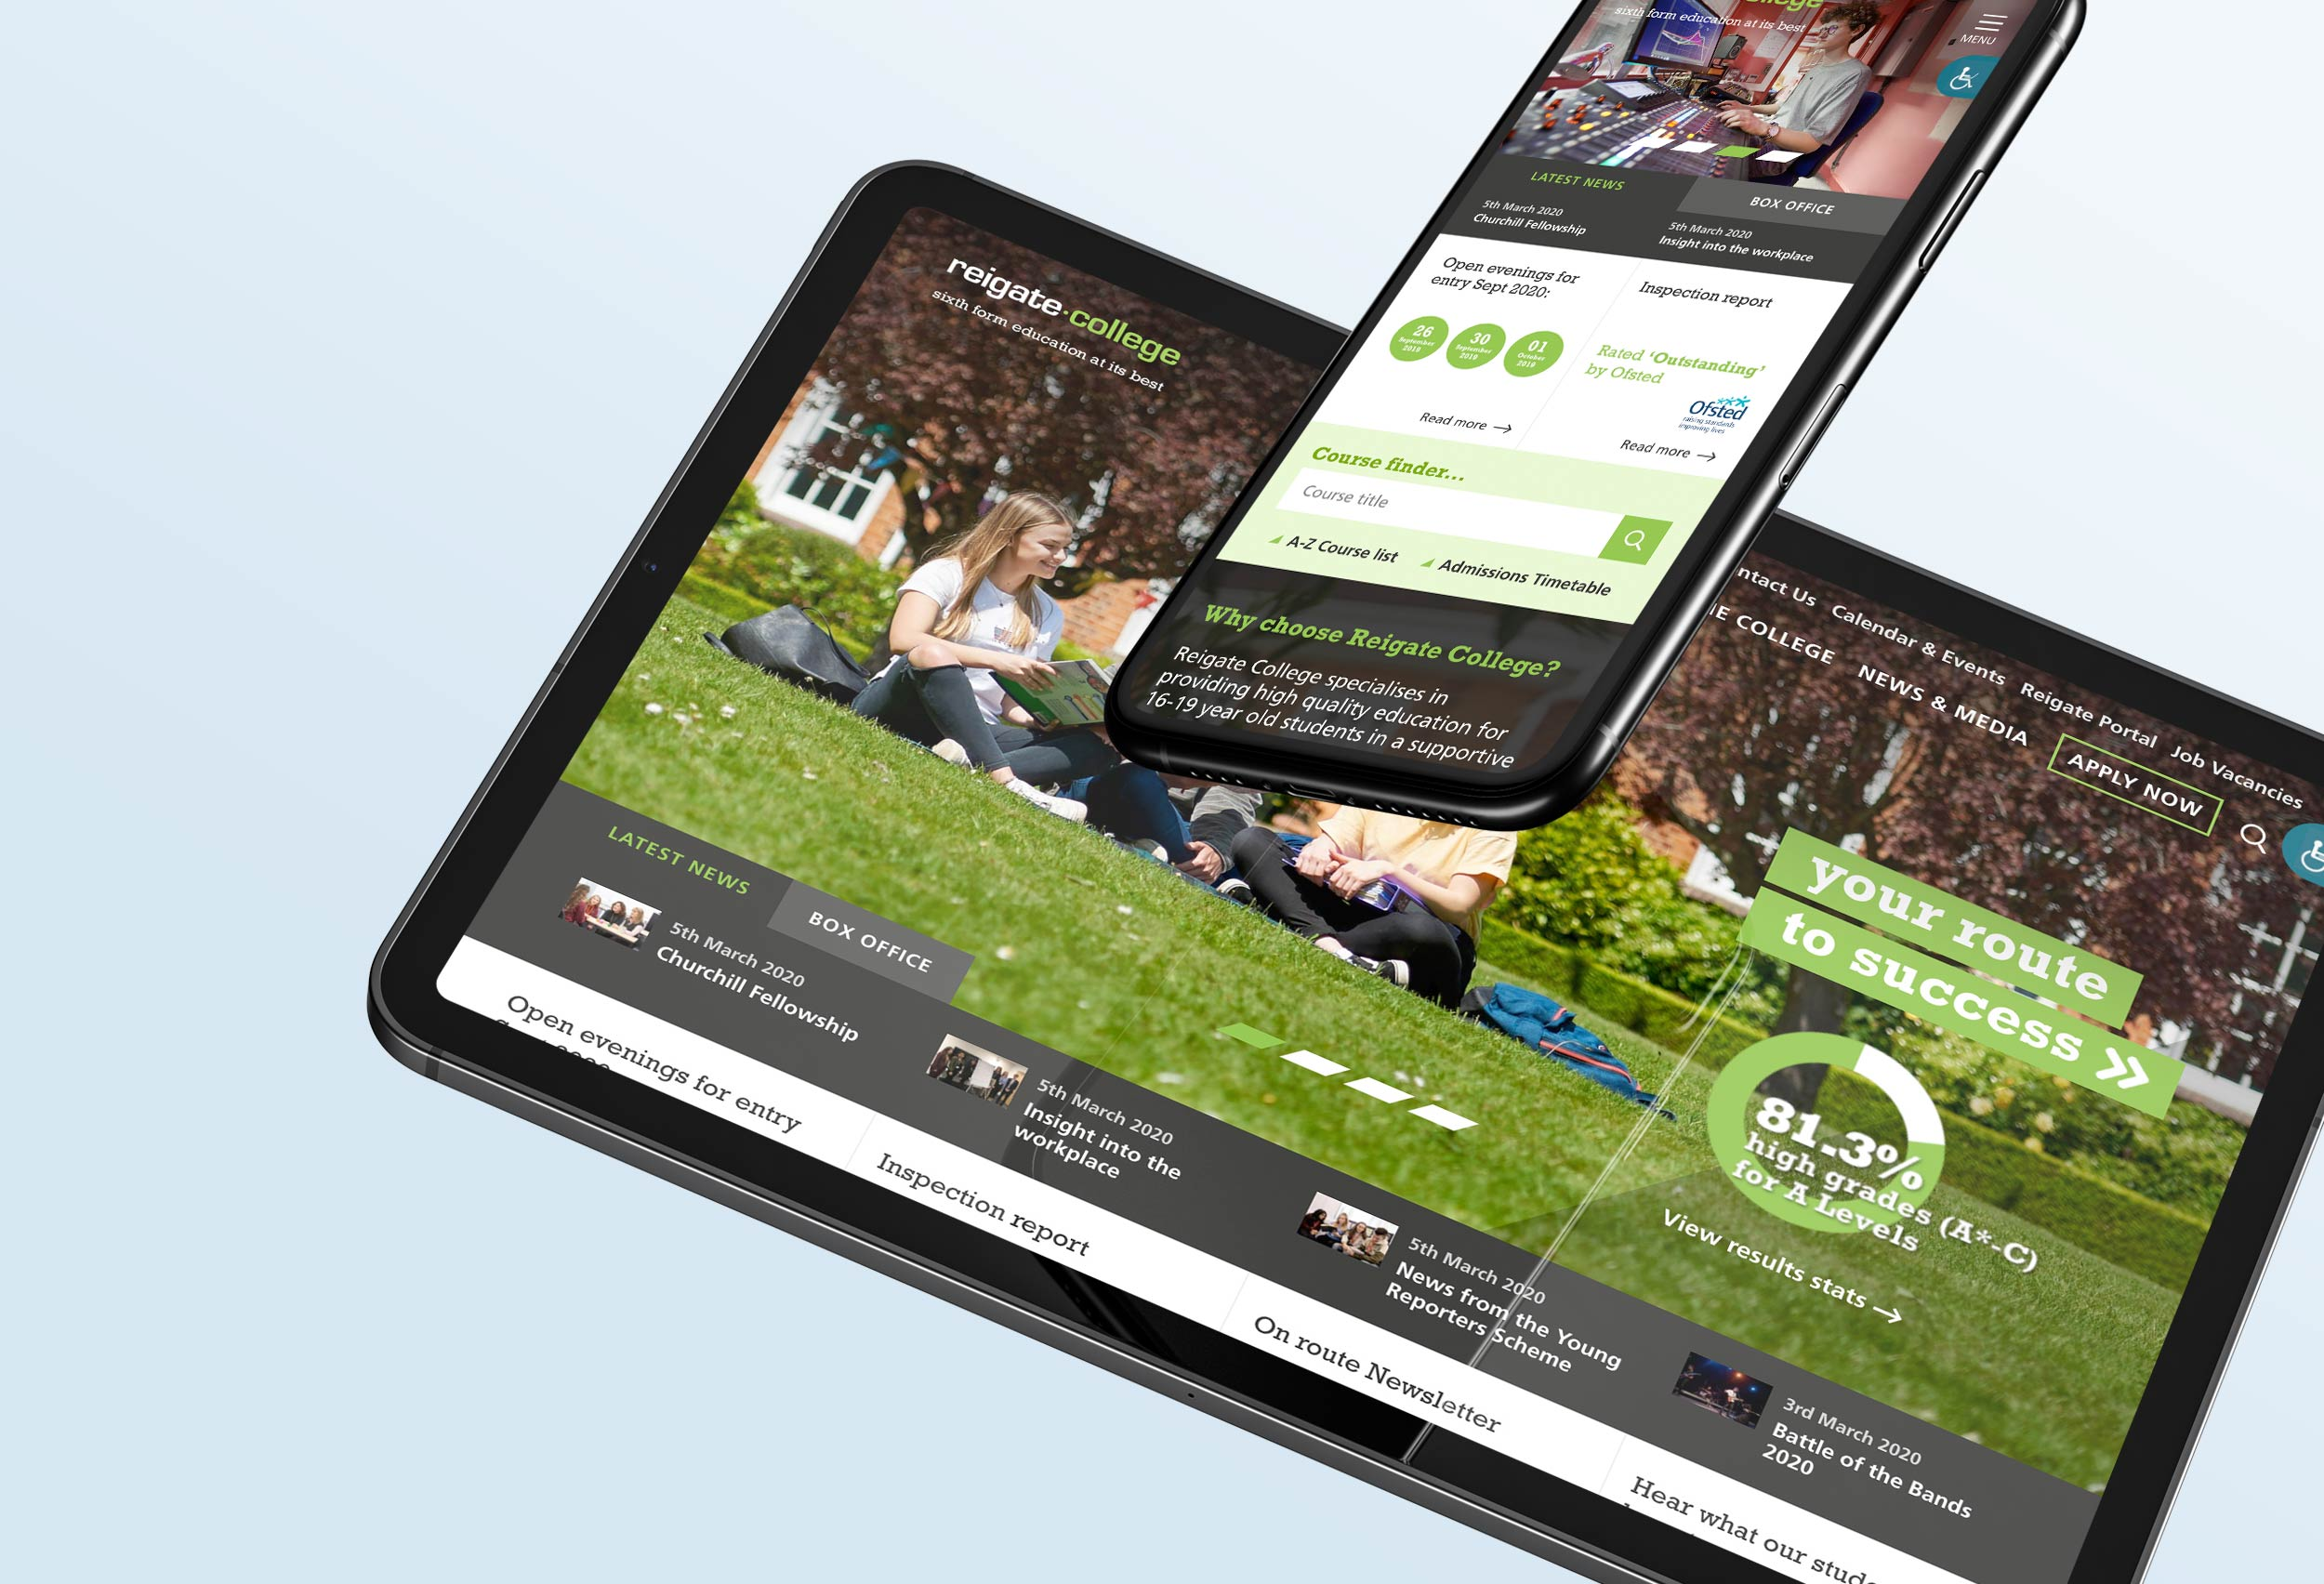 Reigate College website design